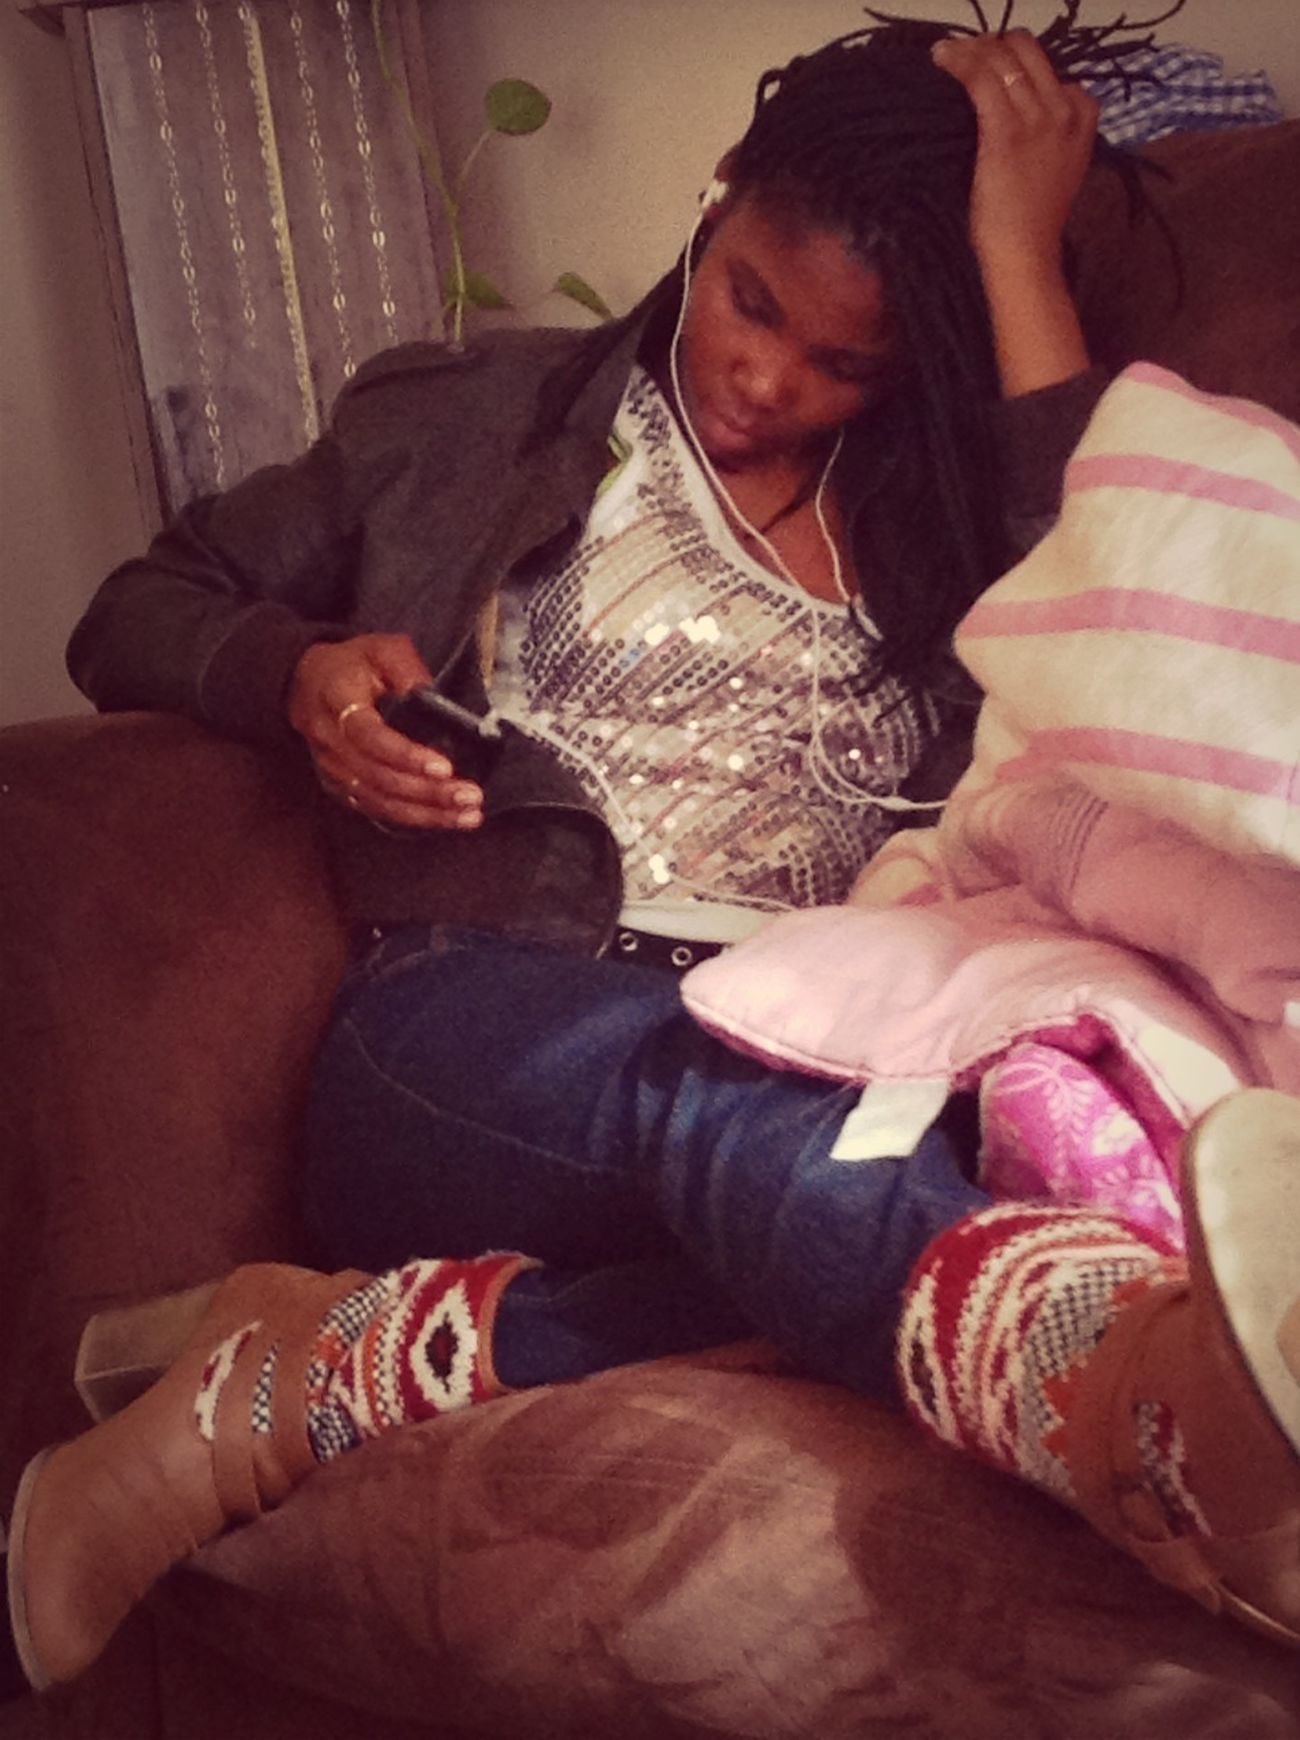 Cauught Chuuu Slippinnn Girllly :)